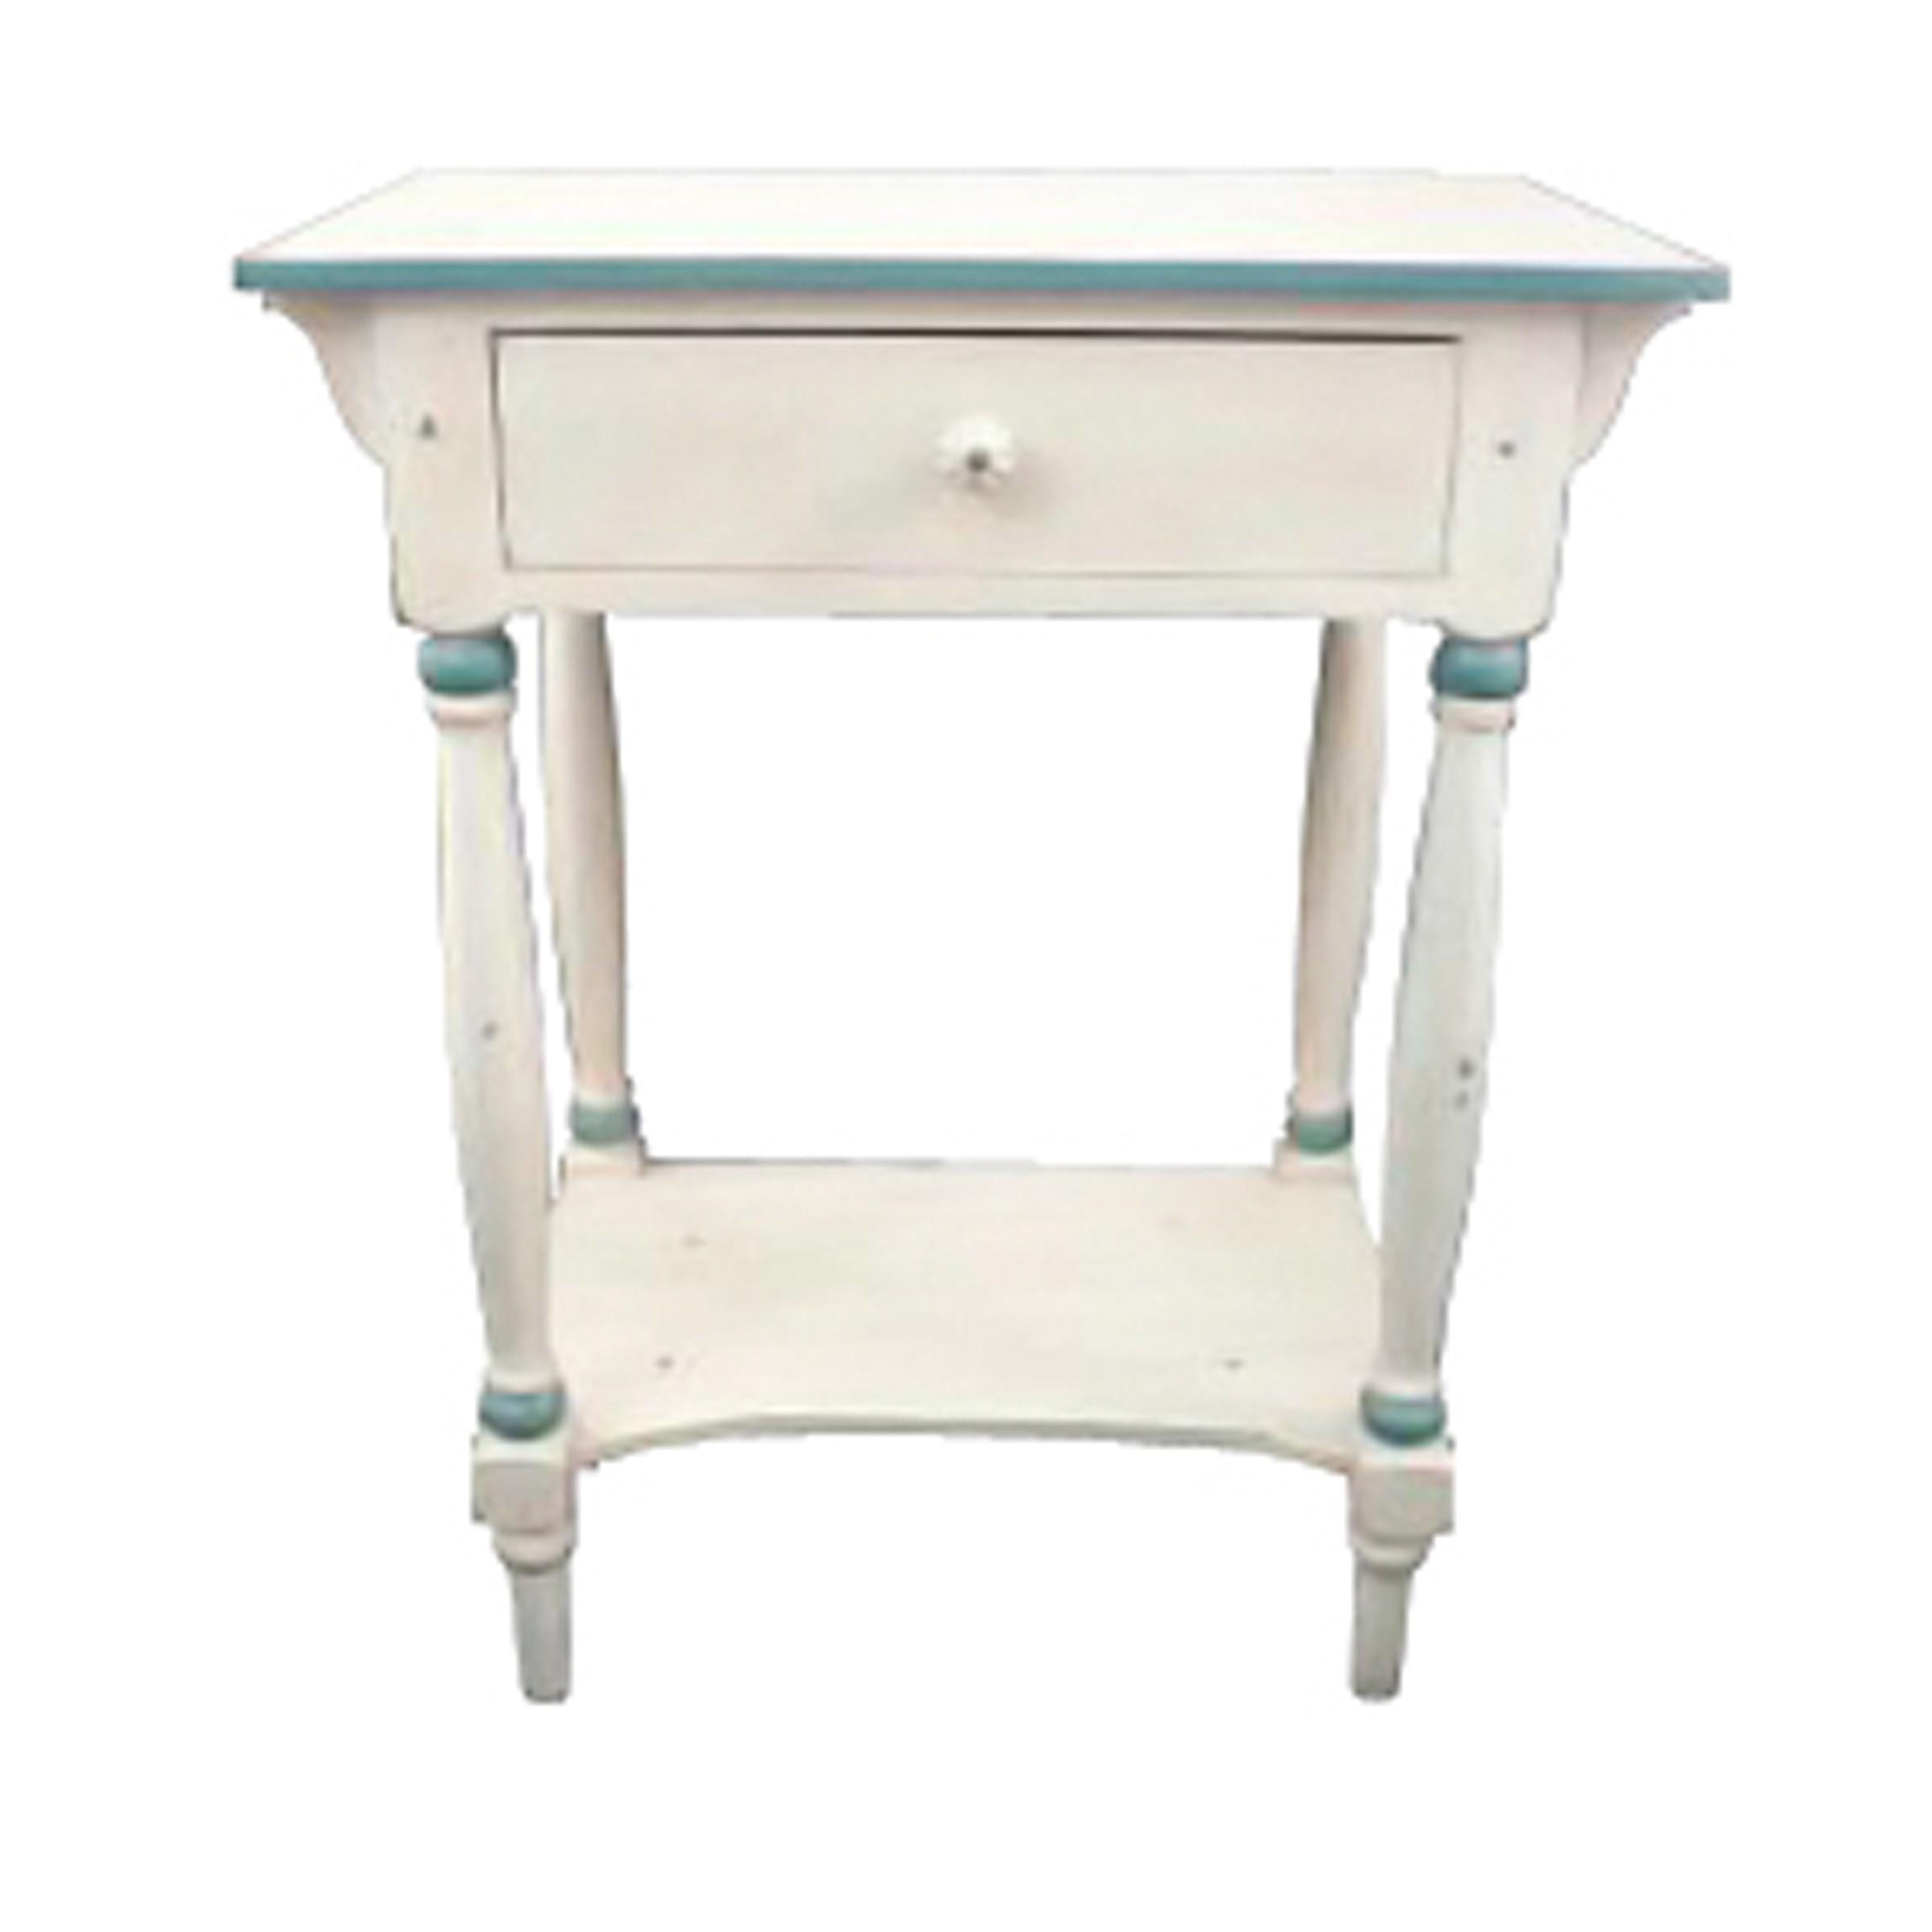 Chevet filet bleu demeure et jardin - Table de chevet bleu ...